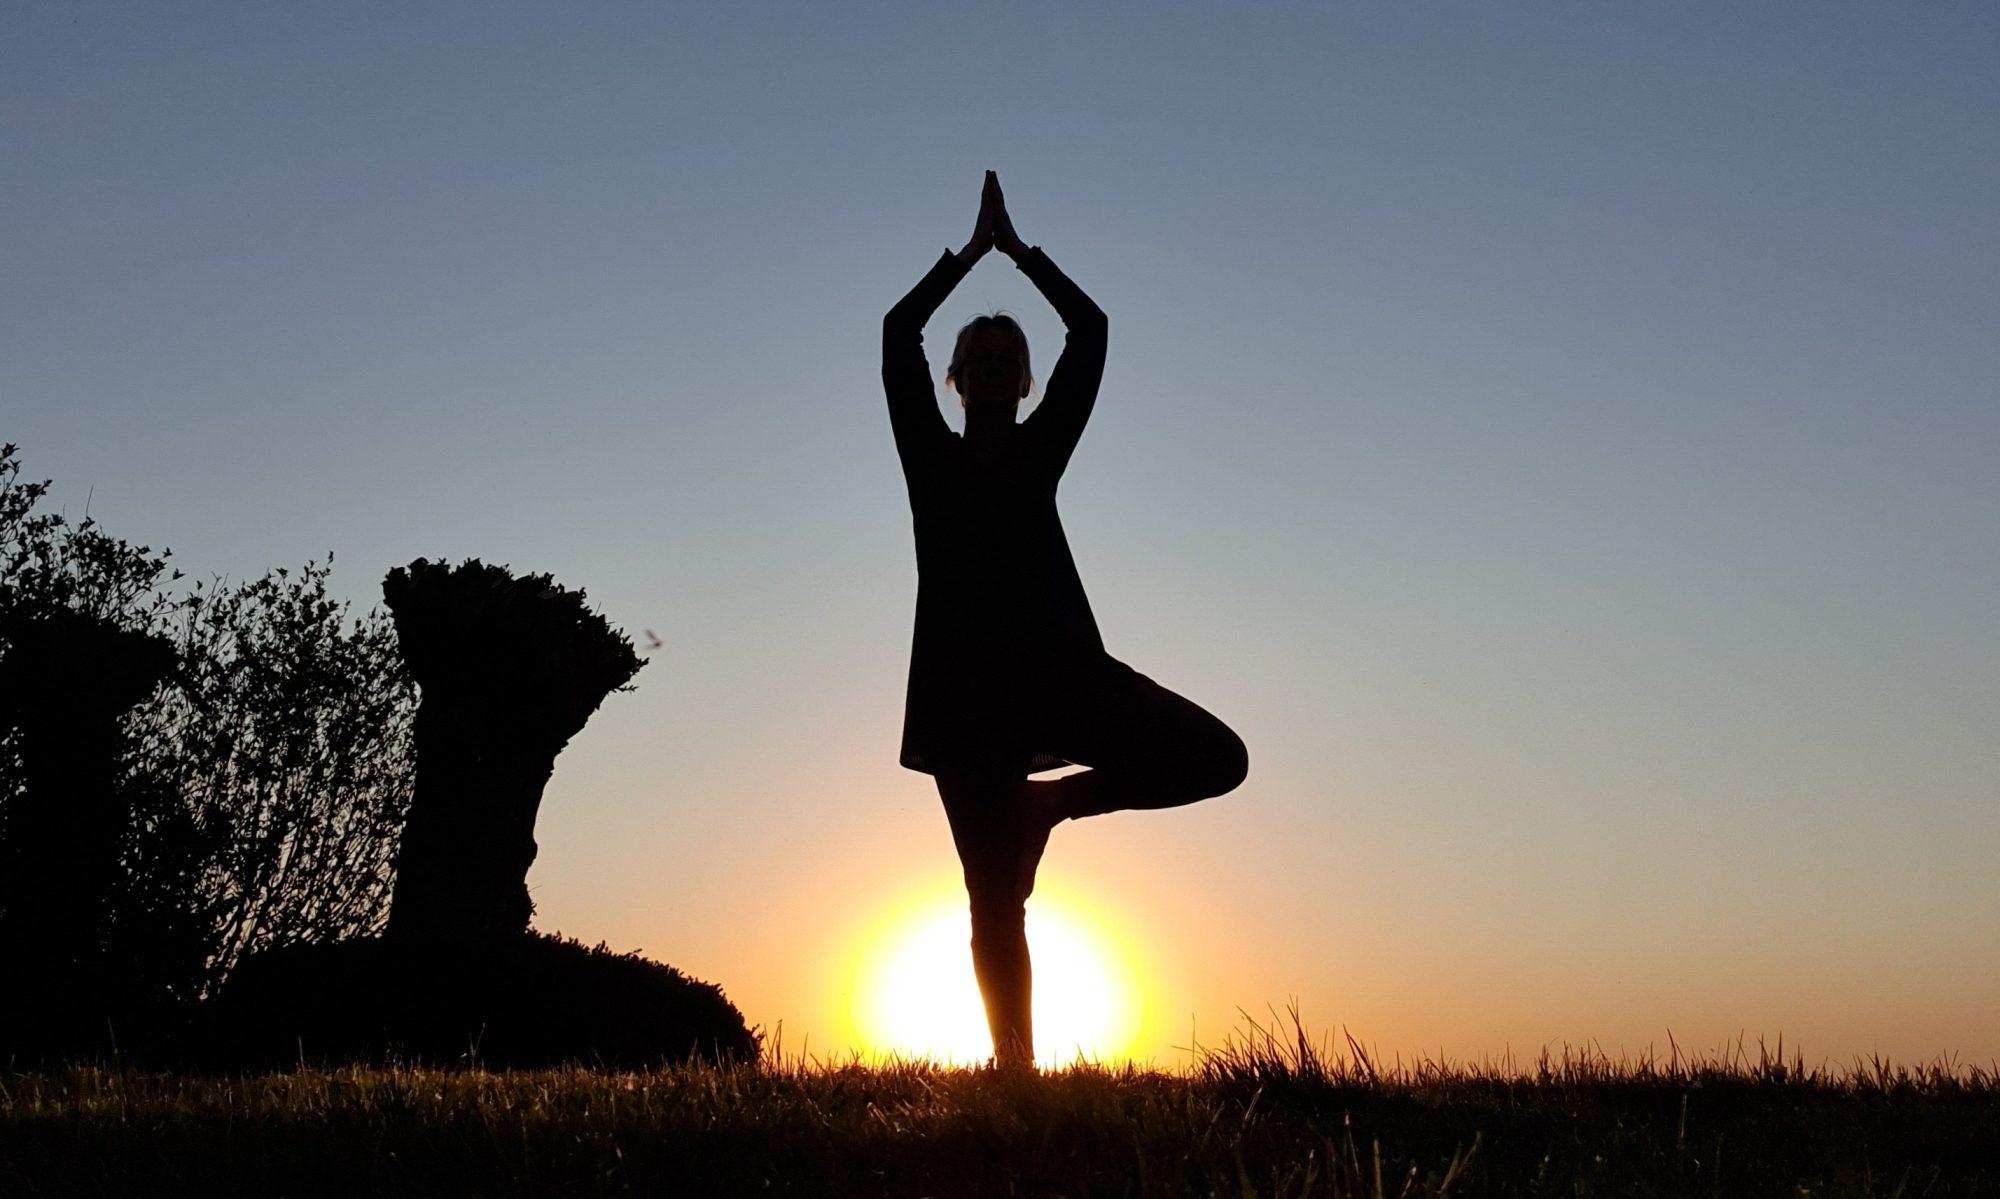 Mâr galliti Yoga